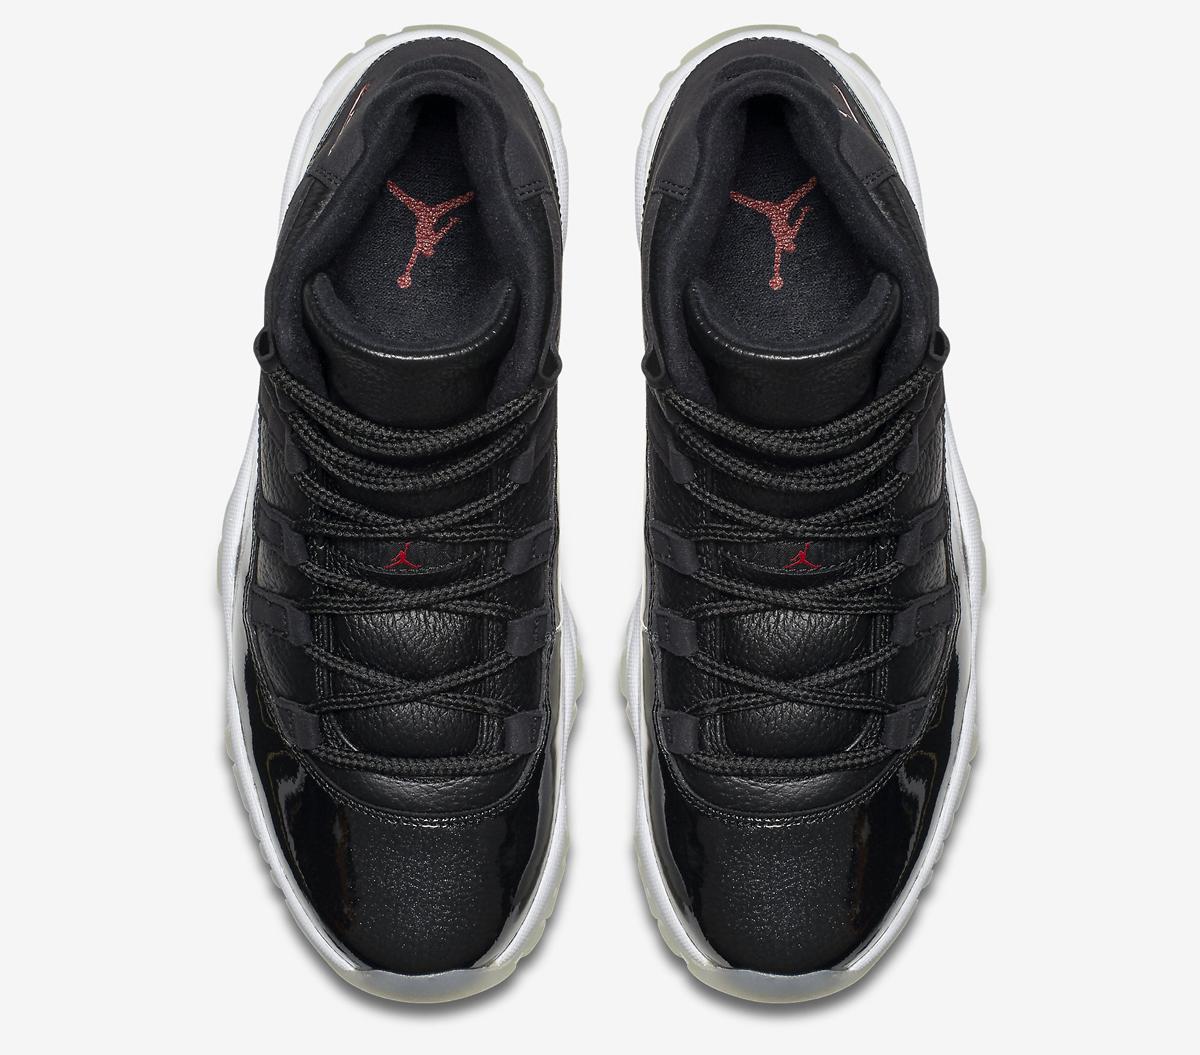 5ff7c54e8d6dc0 Air Jordan 11  72-10  Release Date and Pricing Info